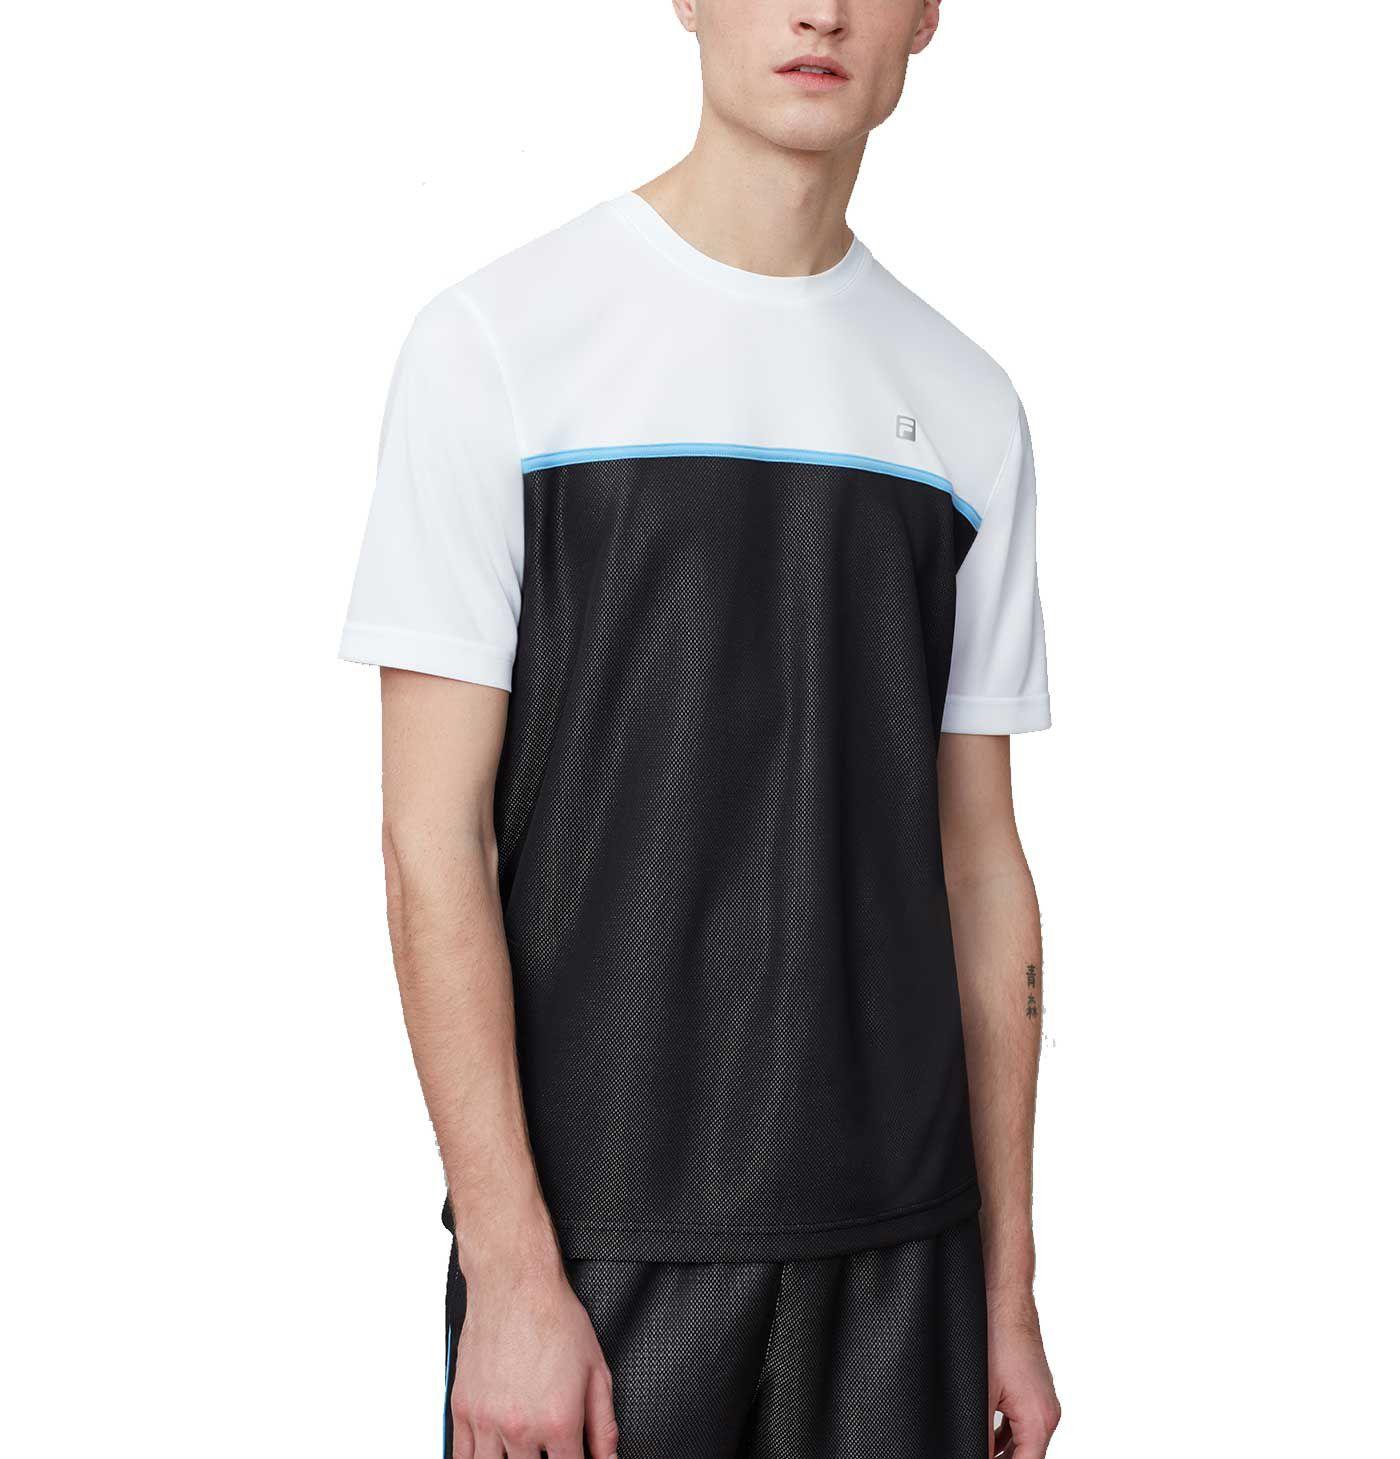 Fila Men's Set Point Colorblocked Crew Neck Tennis Shirt